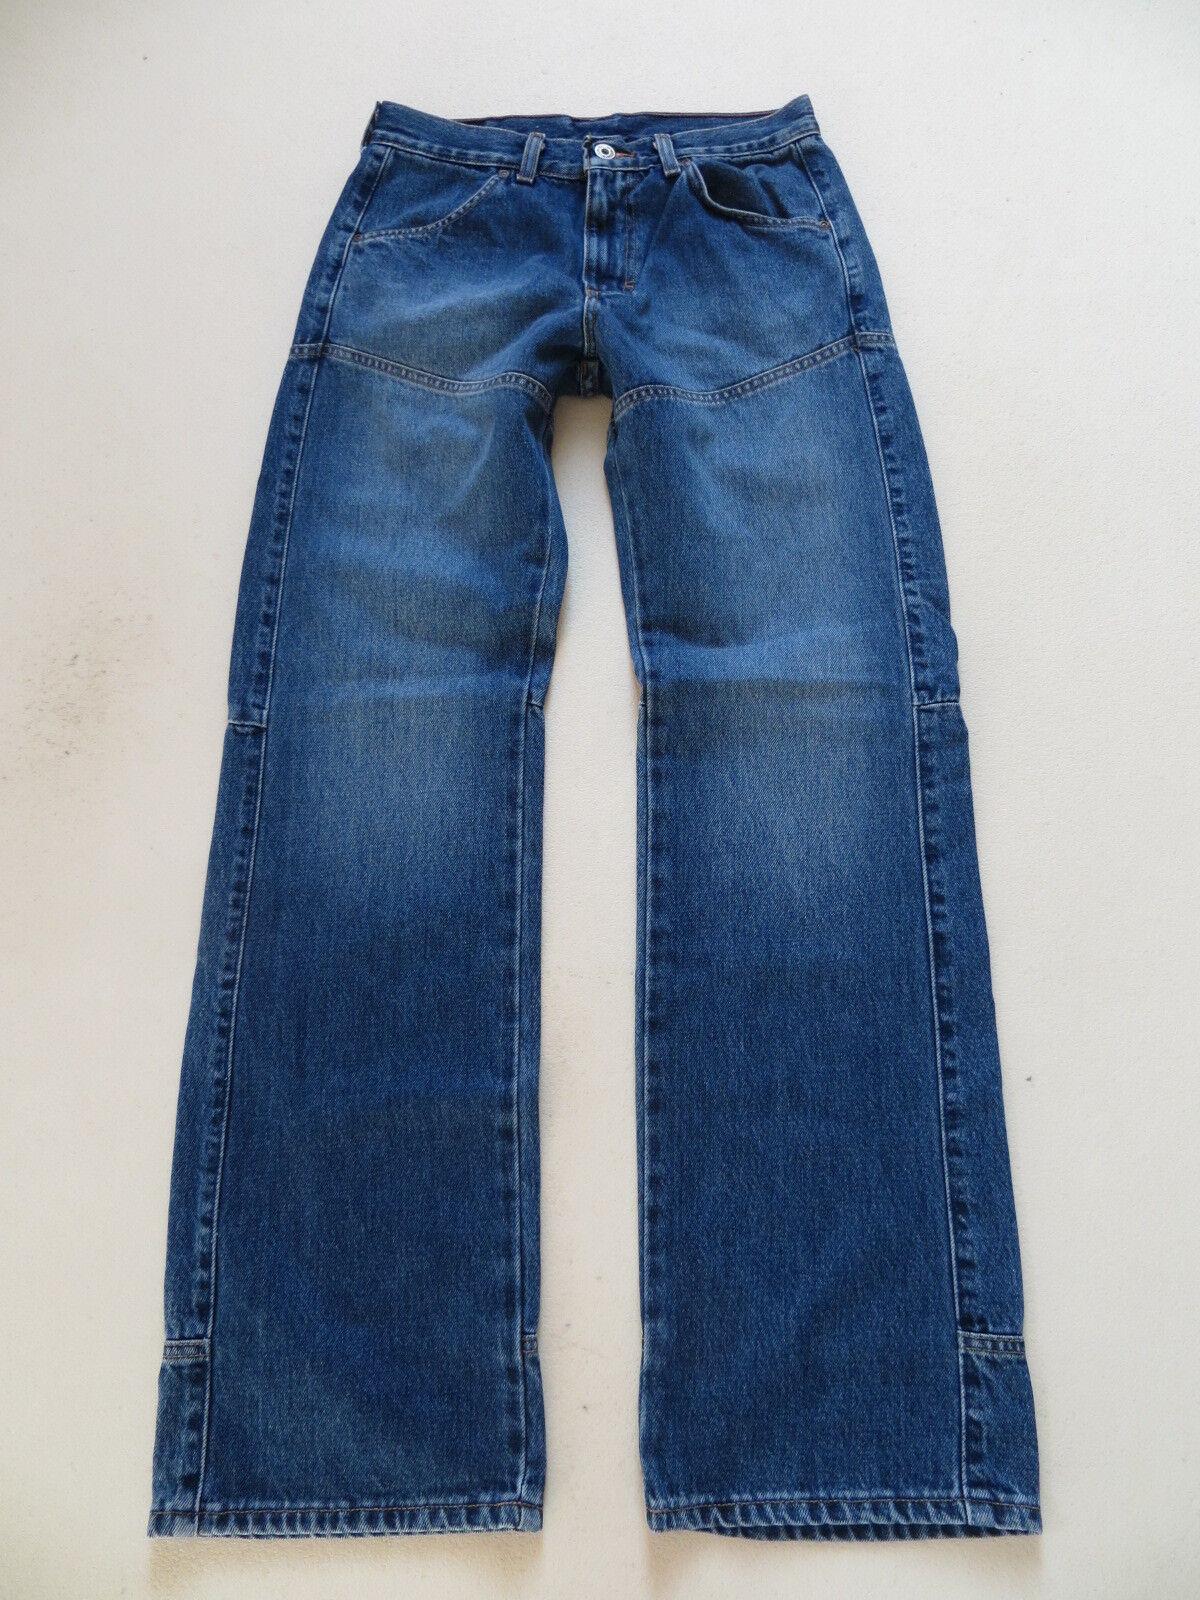 Mustang 9137 Worker Jeans Hose, W 29  L 32, NEU   bluee Denim, Robust & Bequem